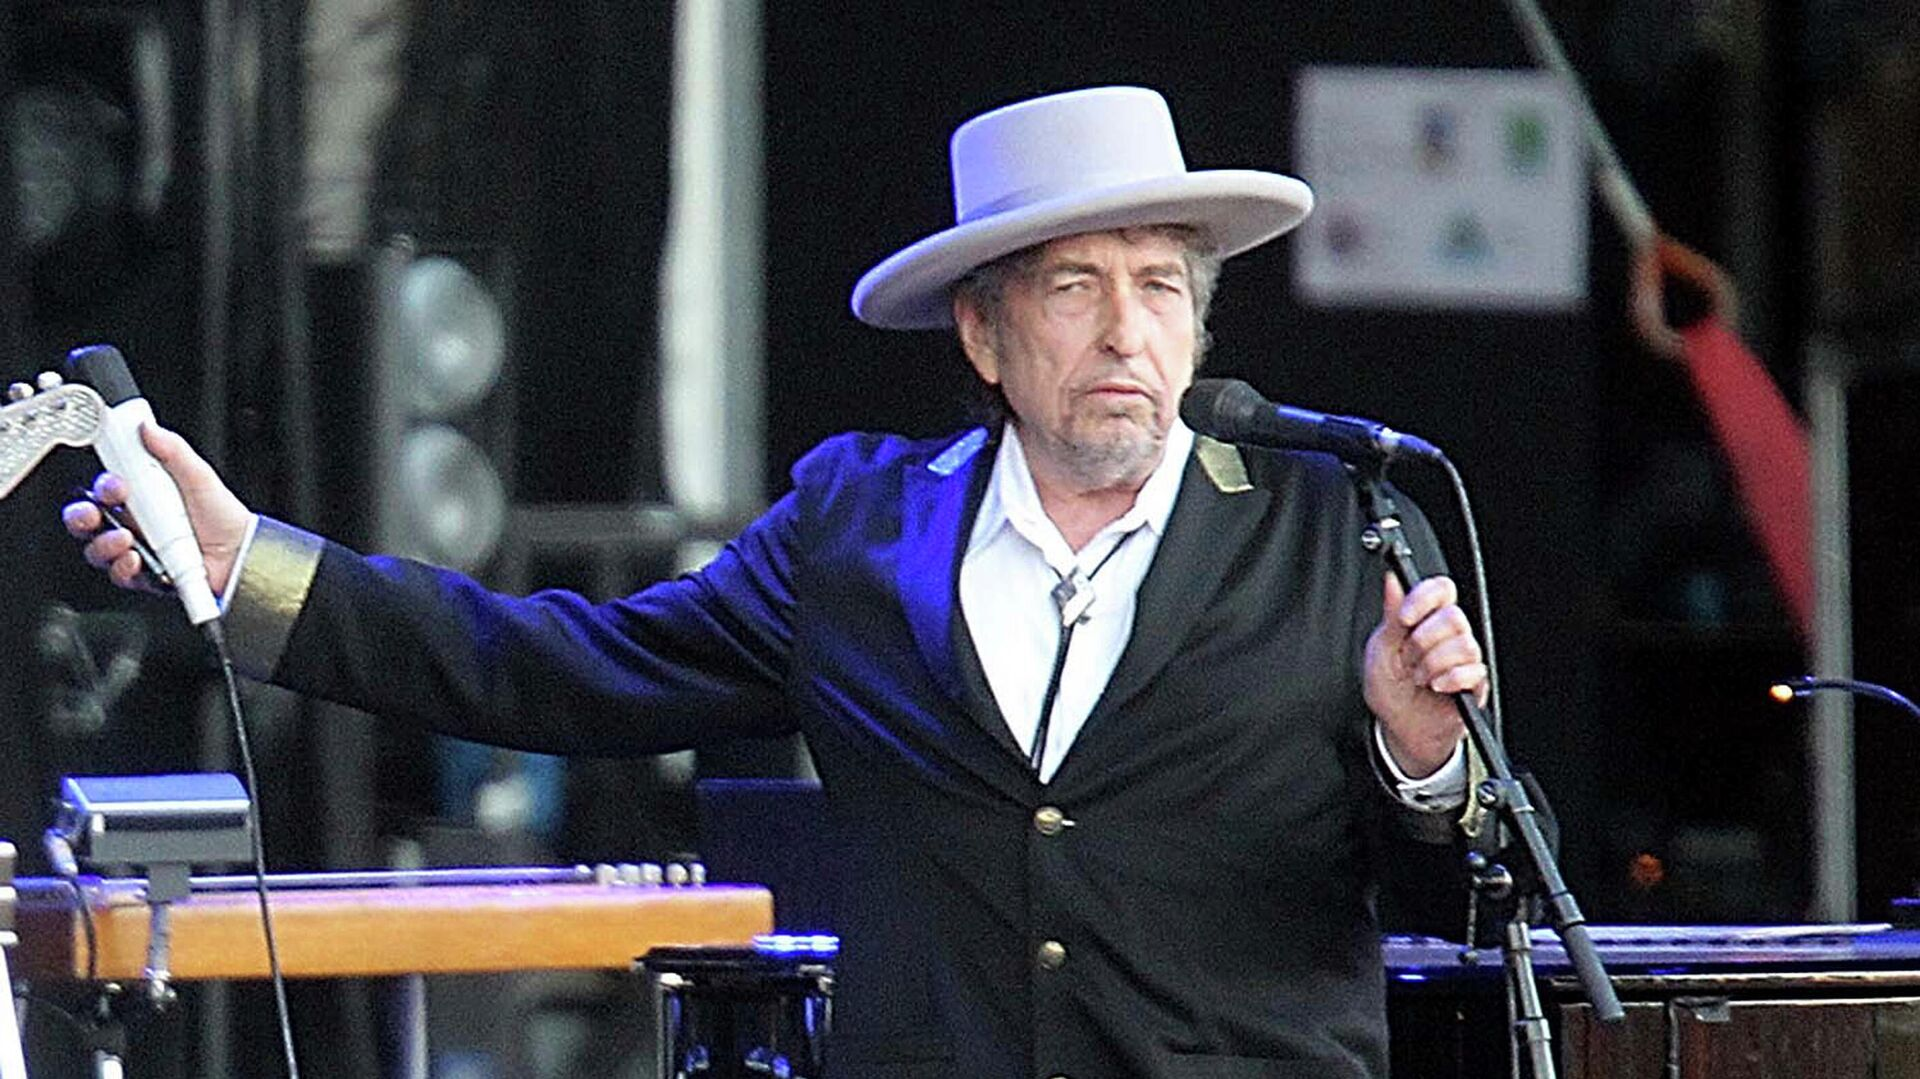 Bob Dylan, cantautor estadounidense - Sputnik Mundo, 1920, 25.05.2021